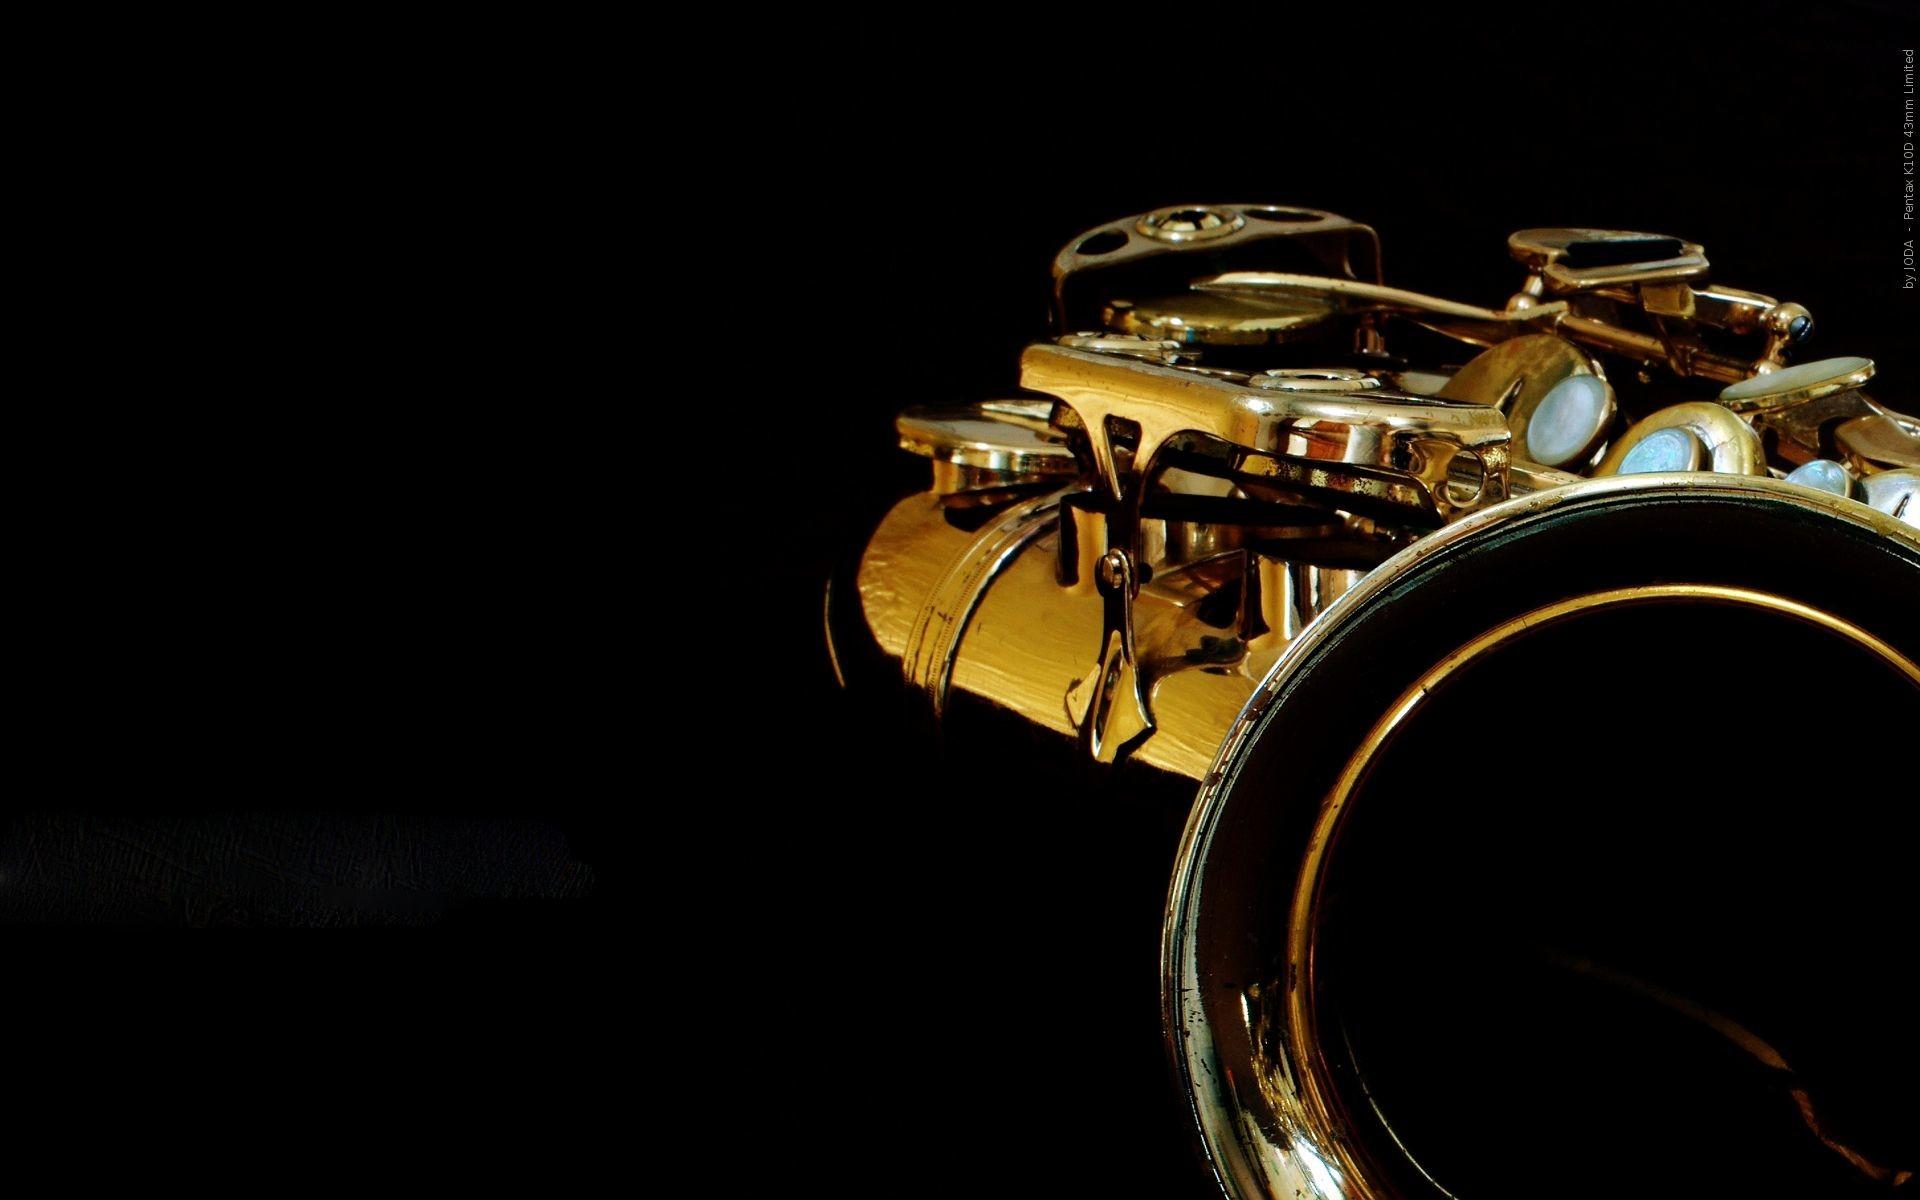 Baritone Saxophone Wallpaper HD Resolution